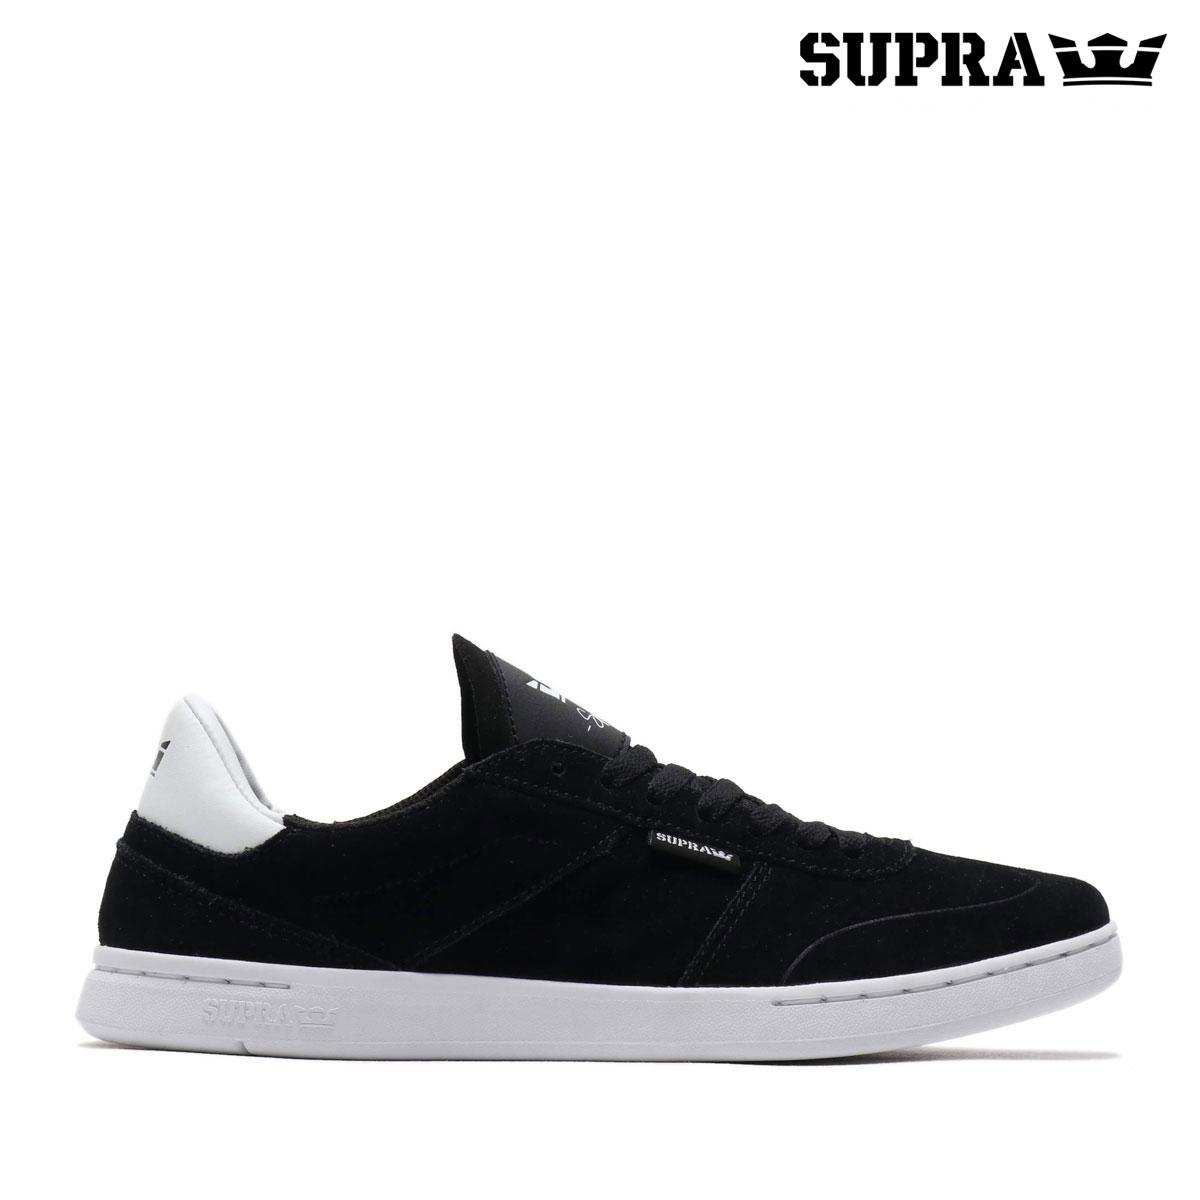 SUPRA ELEVATE(BLACK-WHITE)(スープラ エレベート)【メンズ】【スニーカー】【18FW-I】